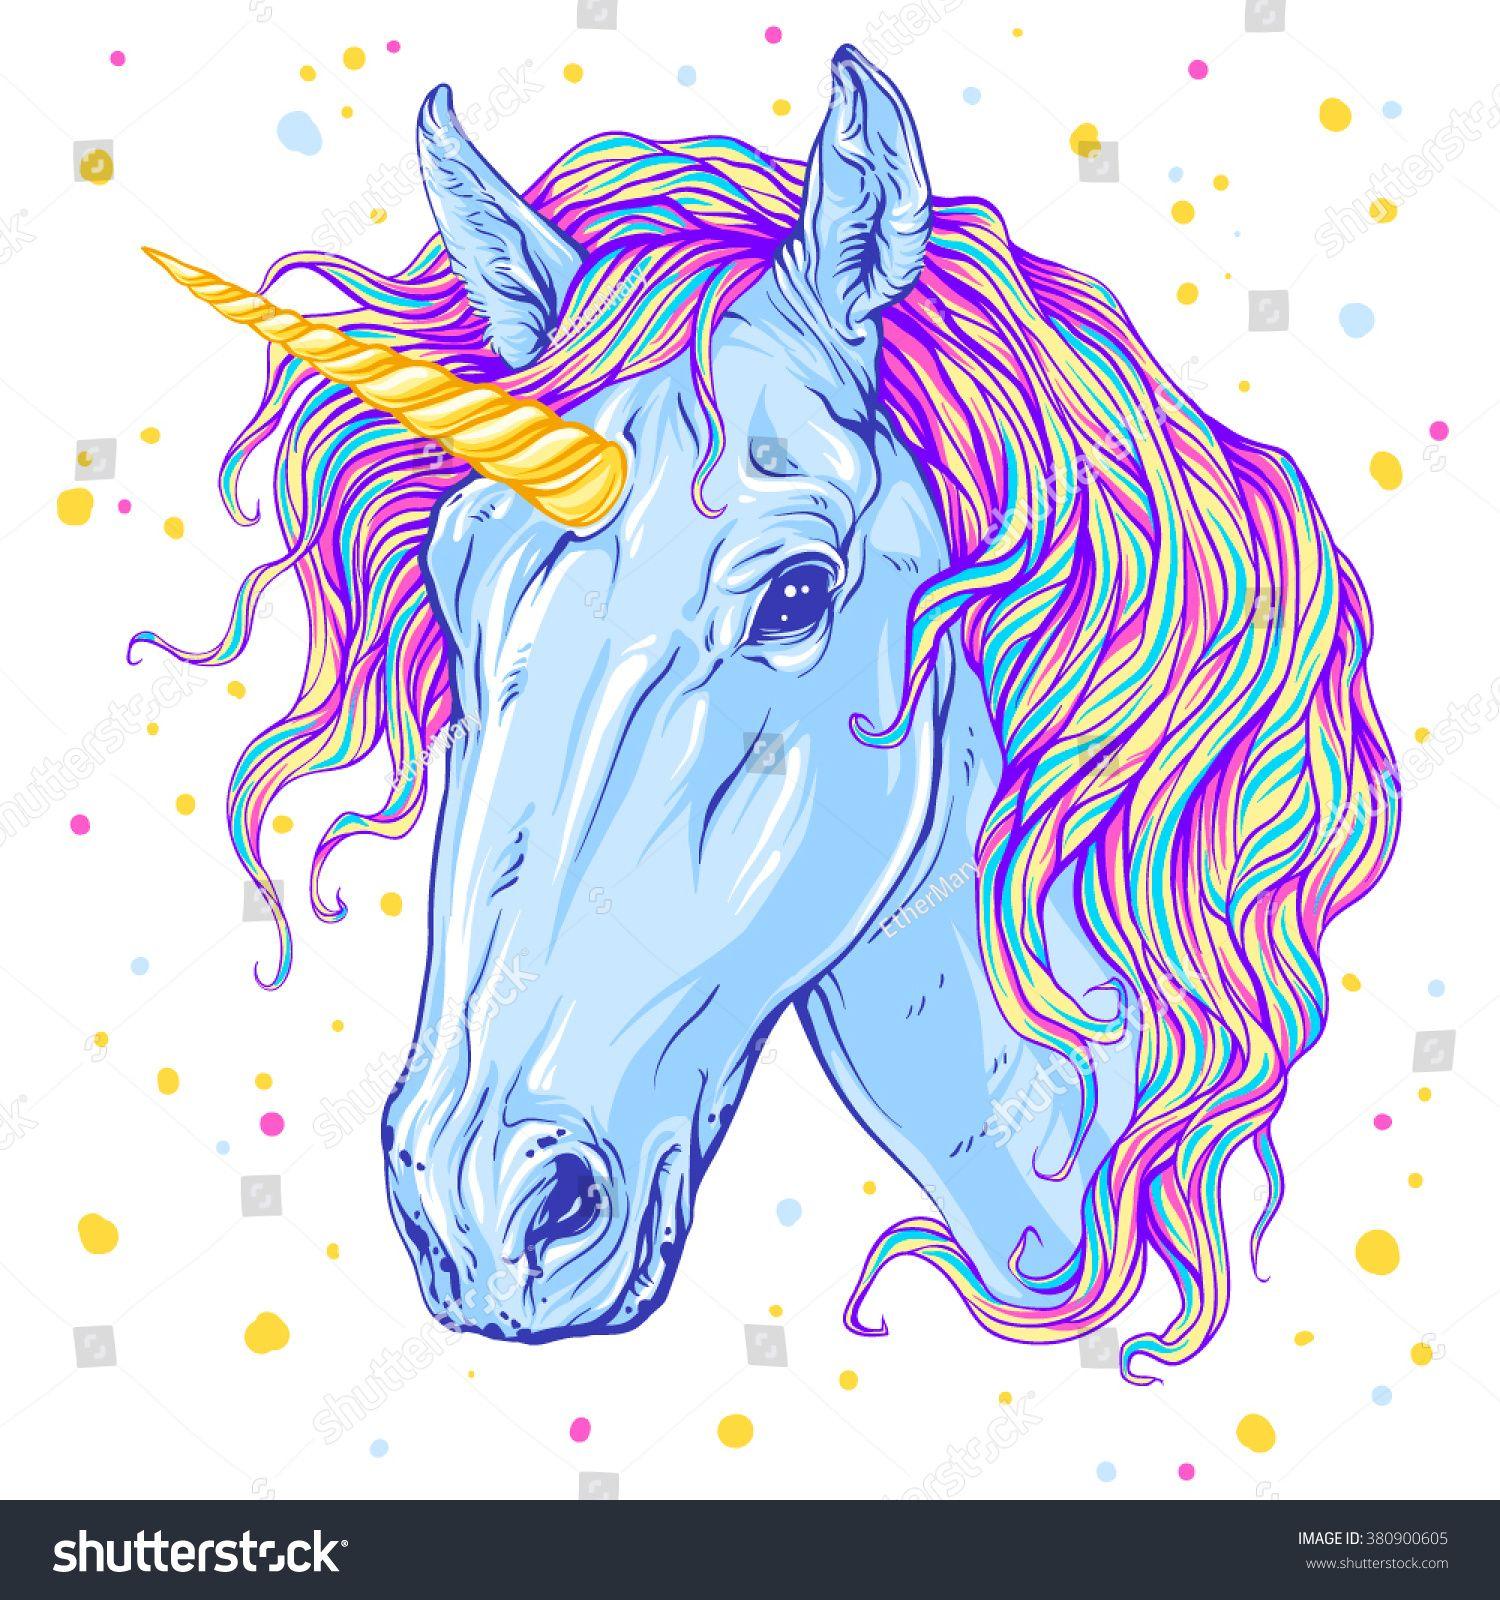 Unicorn. Vector illustration Ad , AD, UnicornVector